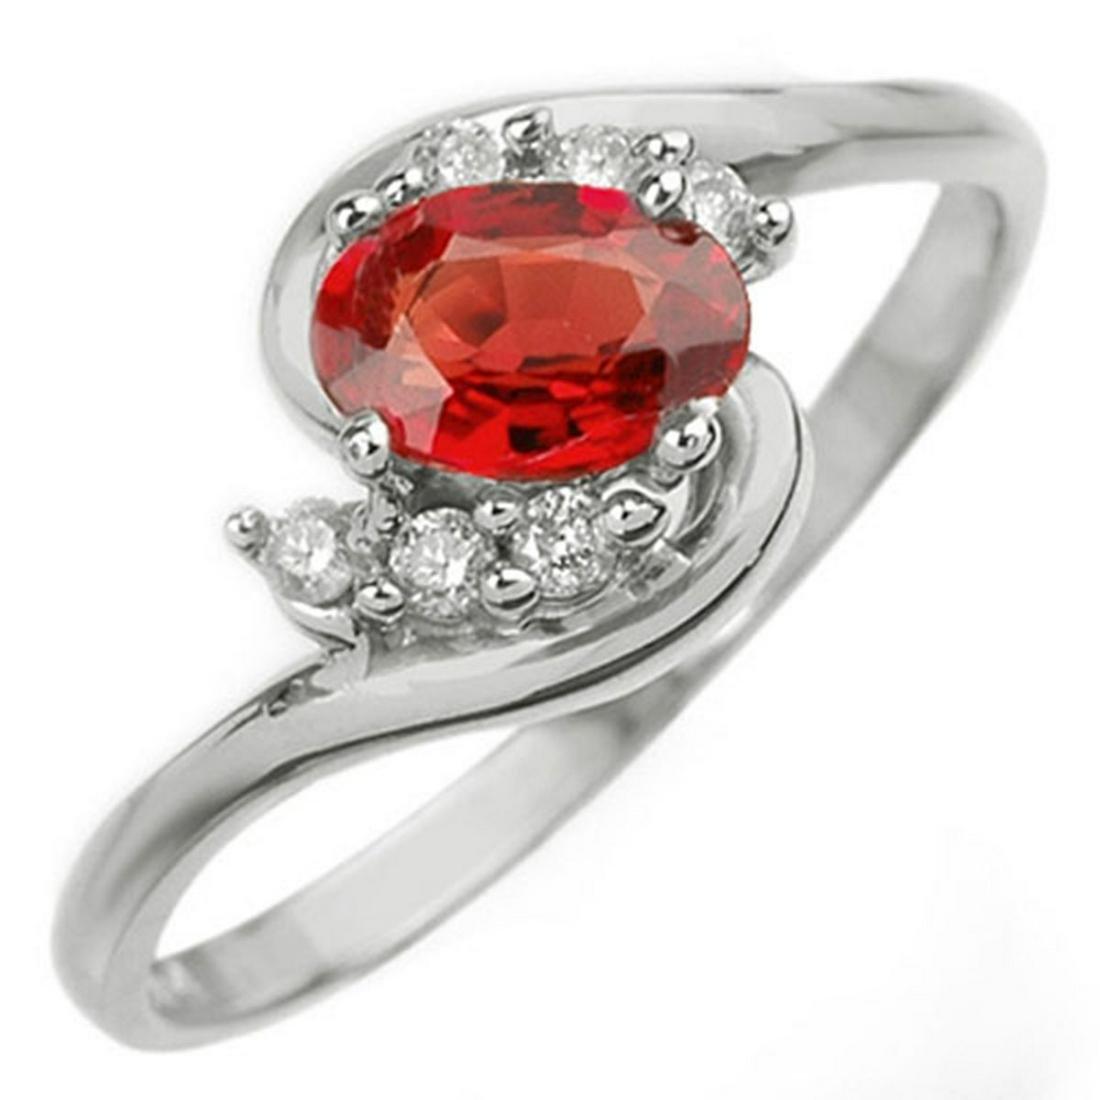 0.70 ctw Red Sapphire & Diamond Ring 18K White Gold